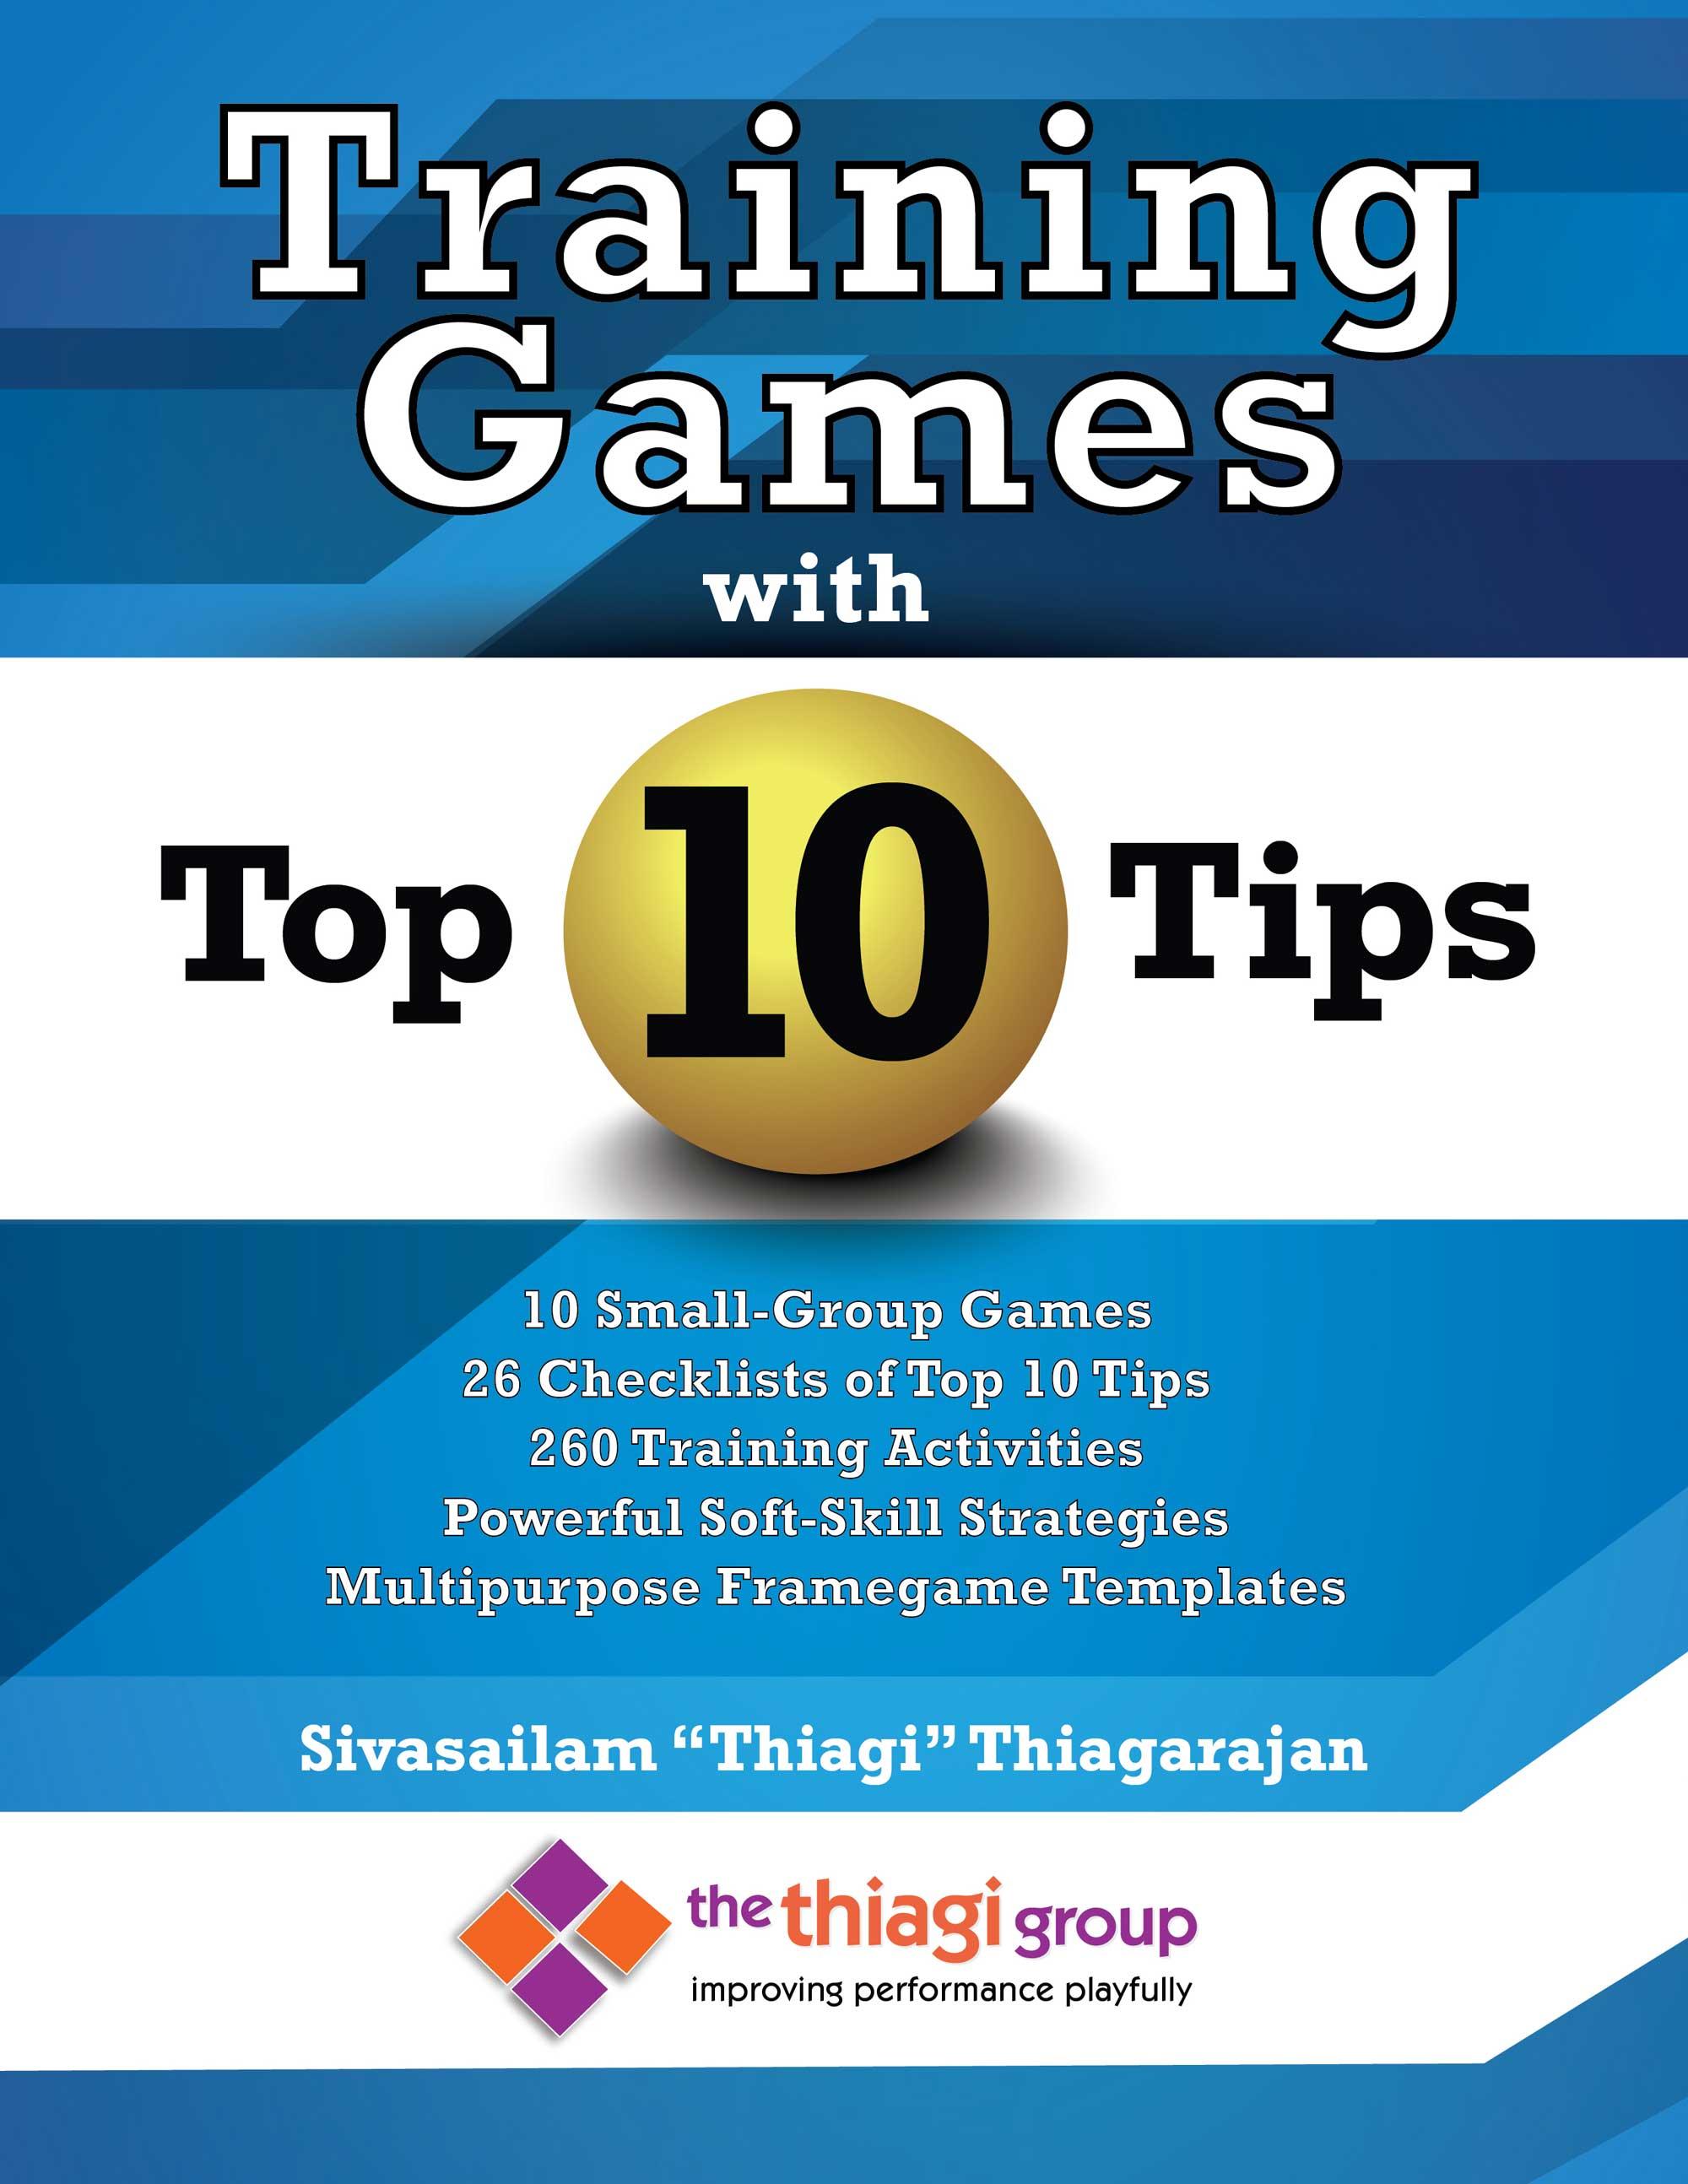 10-games-cover.jpg